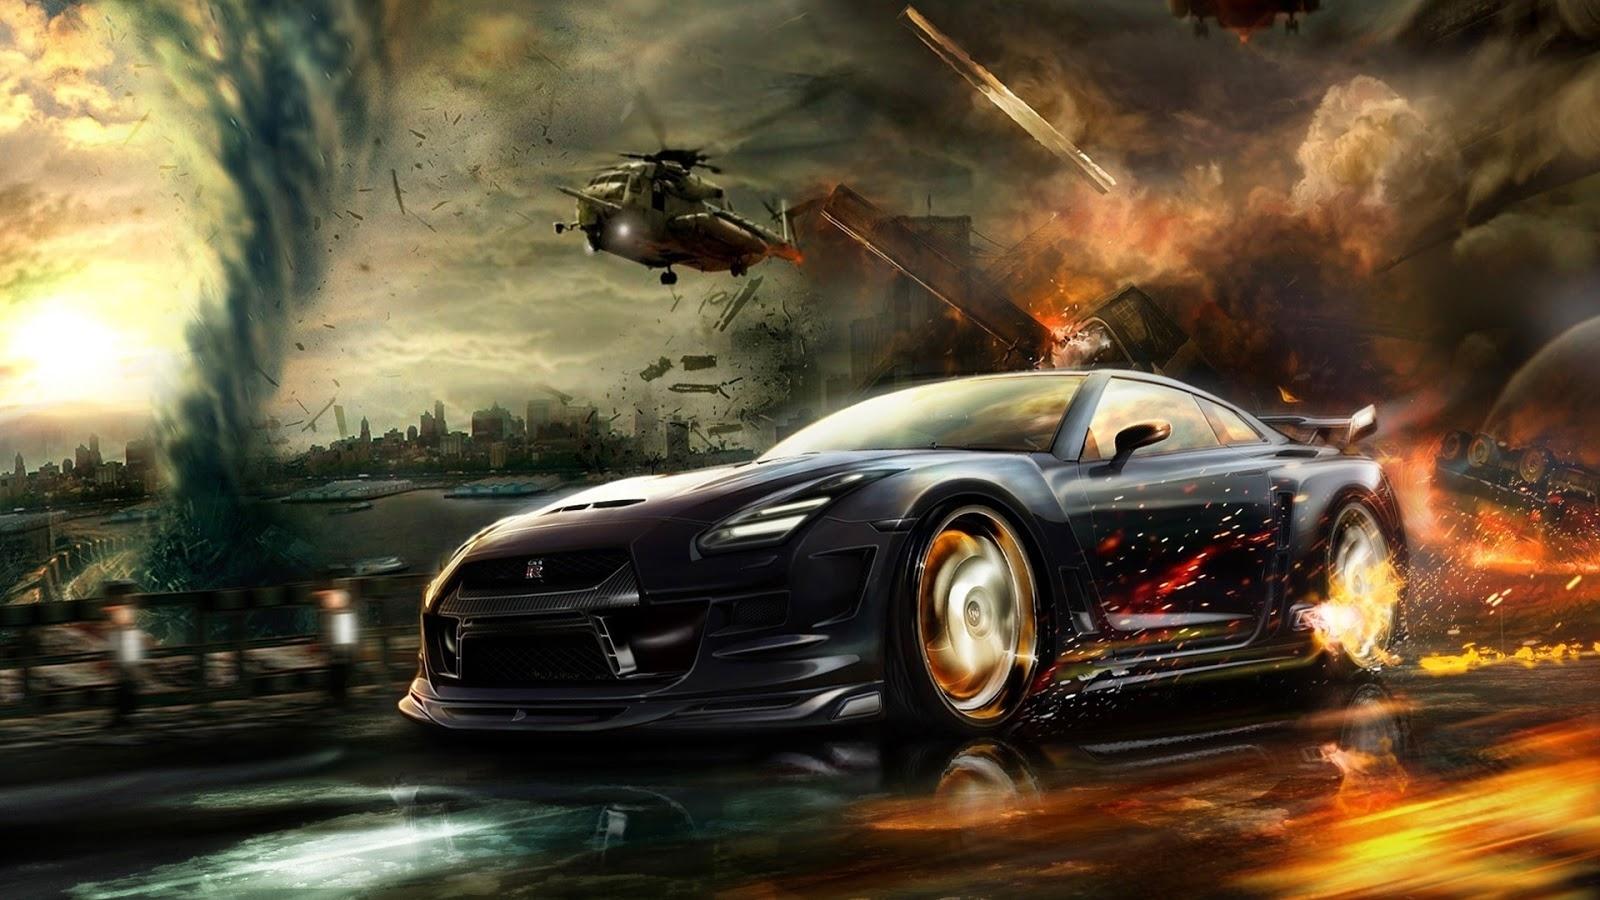 download racing car wallpaper for desktop hd images widescreen cars